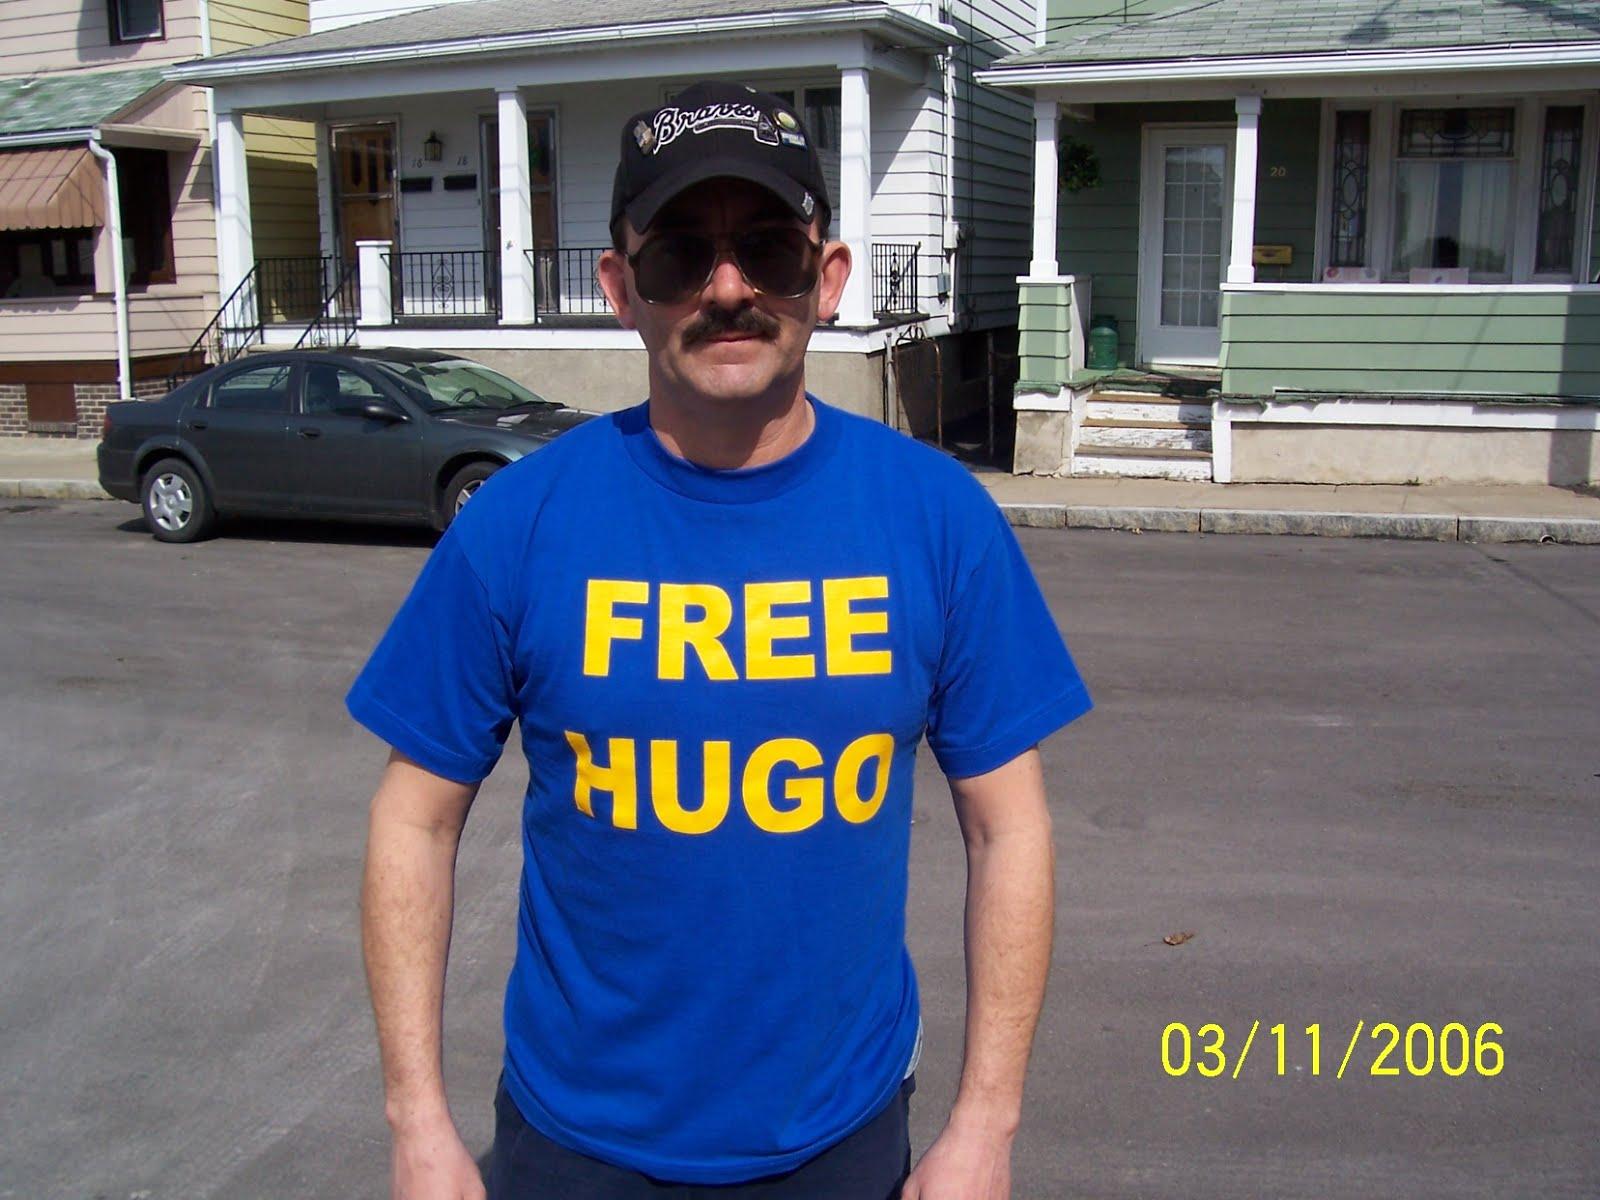 free hugo